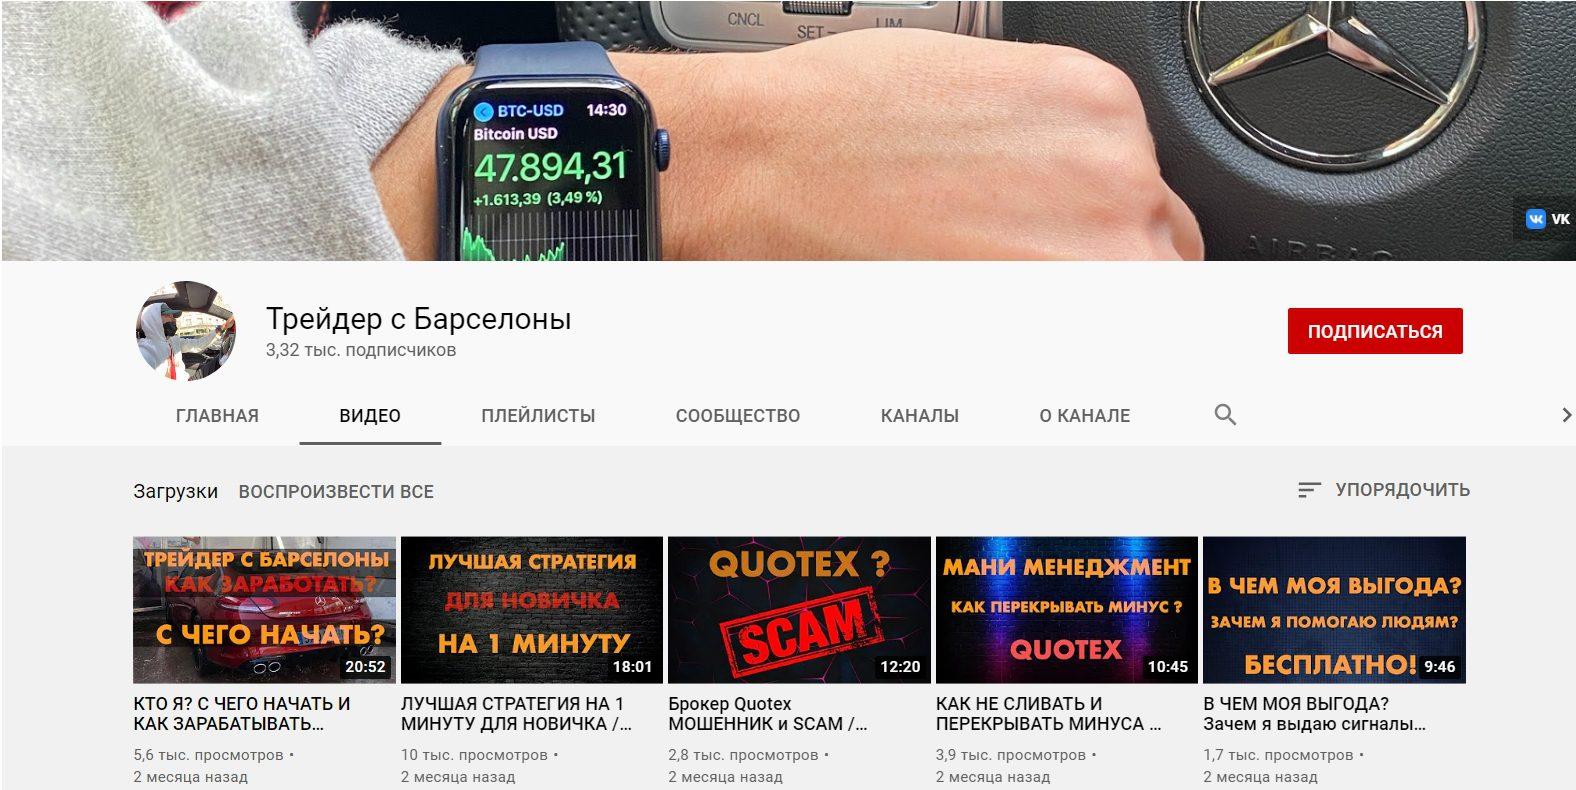 Ютуб канал Кирилла Горлачева